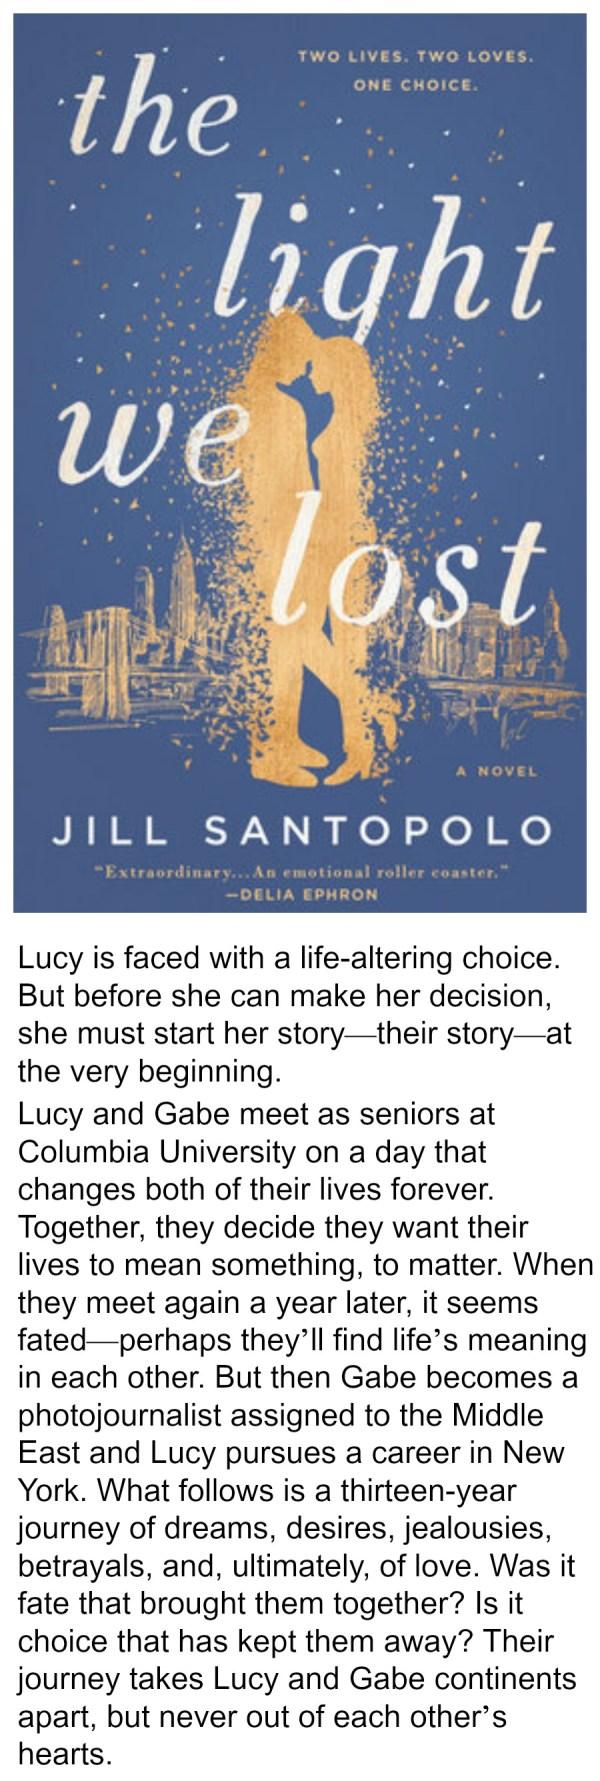 The Light We Lost, Jill Santopolo, summer reading, best books of 2017, summer reading 2017, love story, fiction